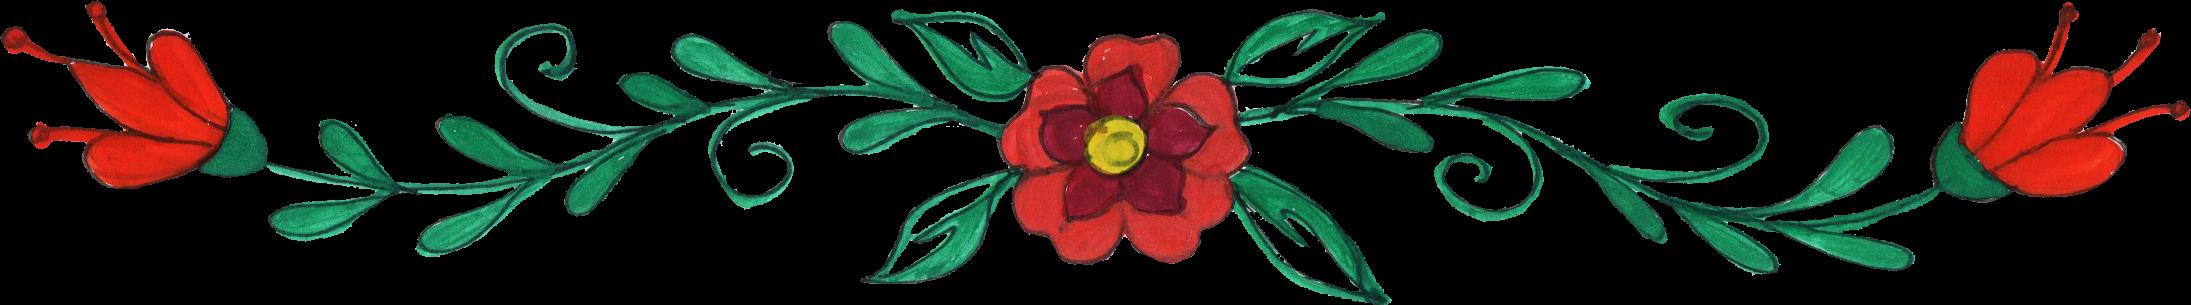 Flowers border png.  flower drawing transparent